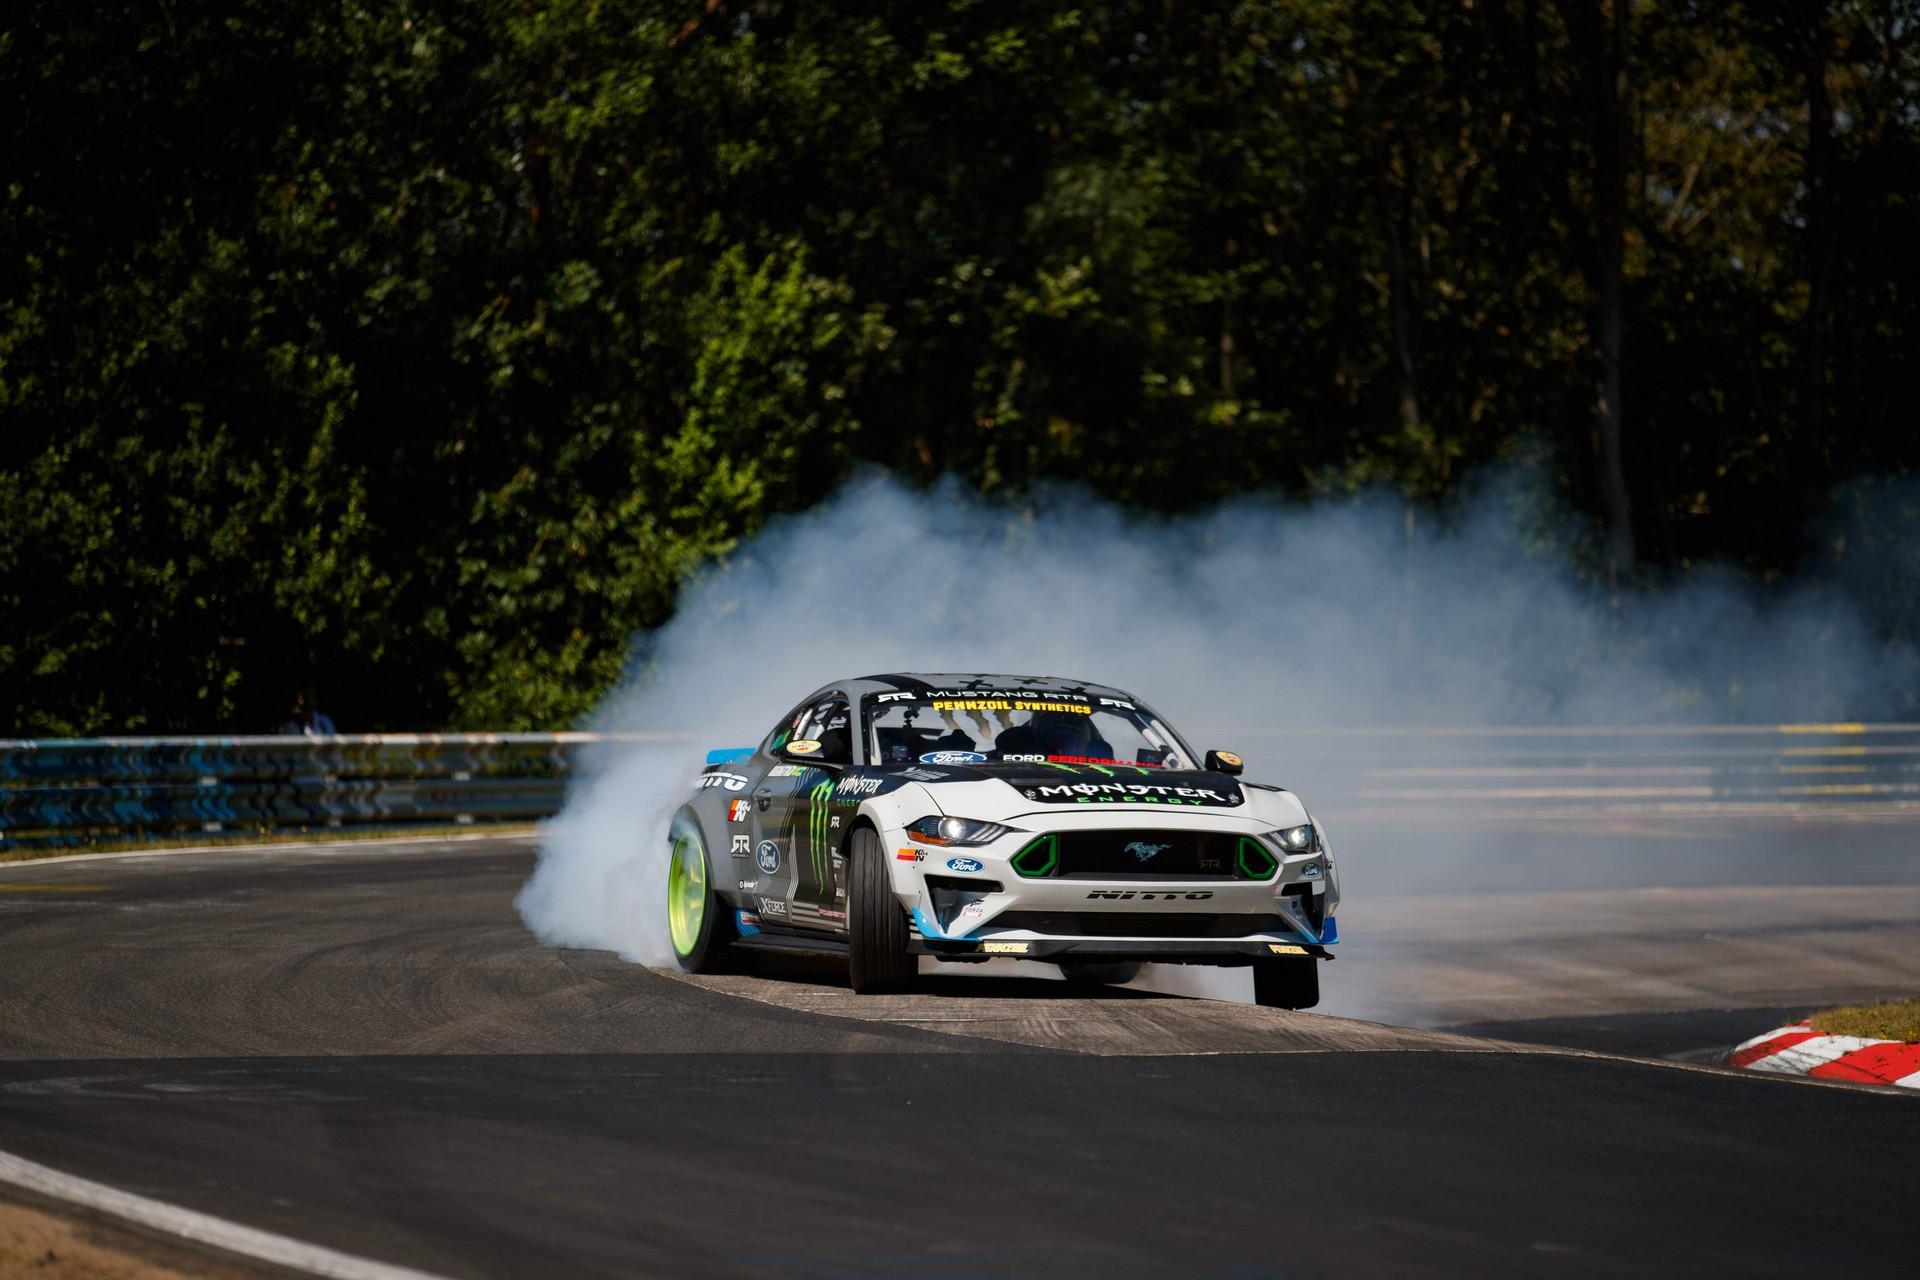 Ford_Mustang_RTR_Nurburgring_0007